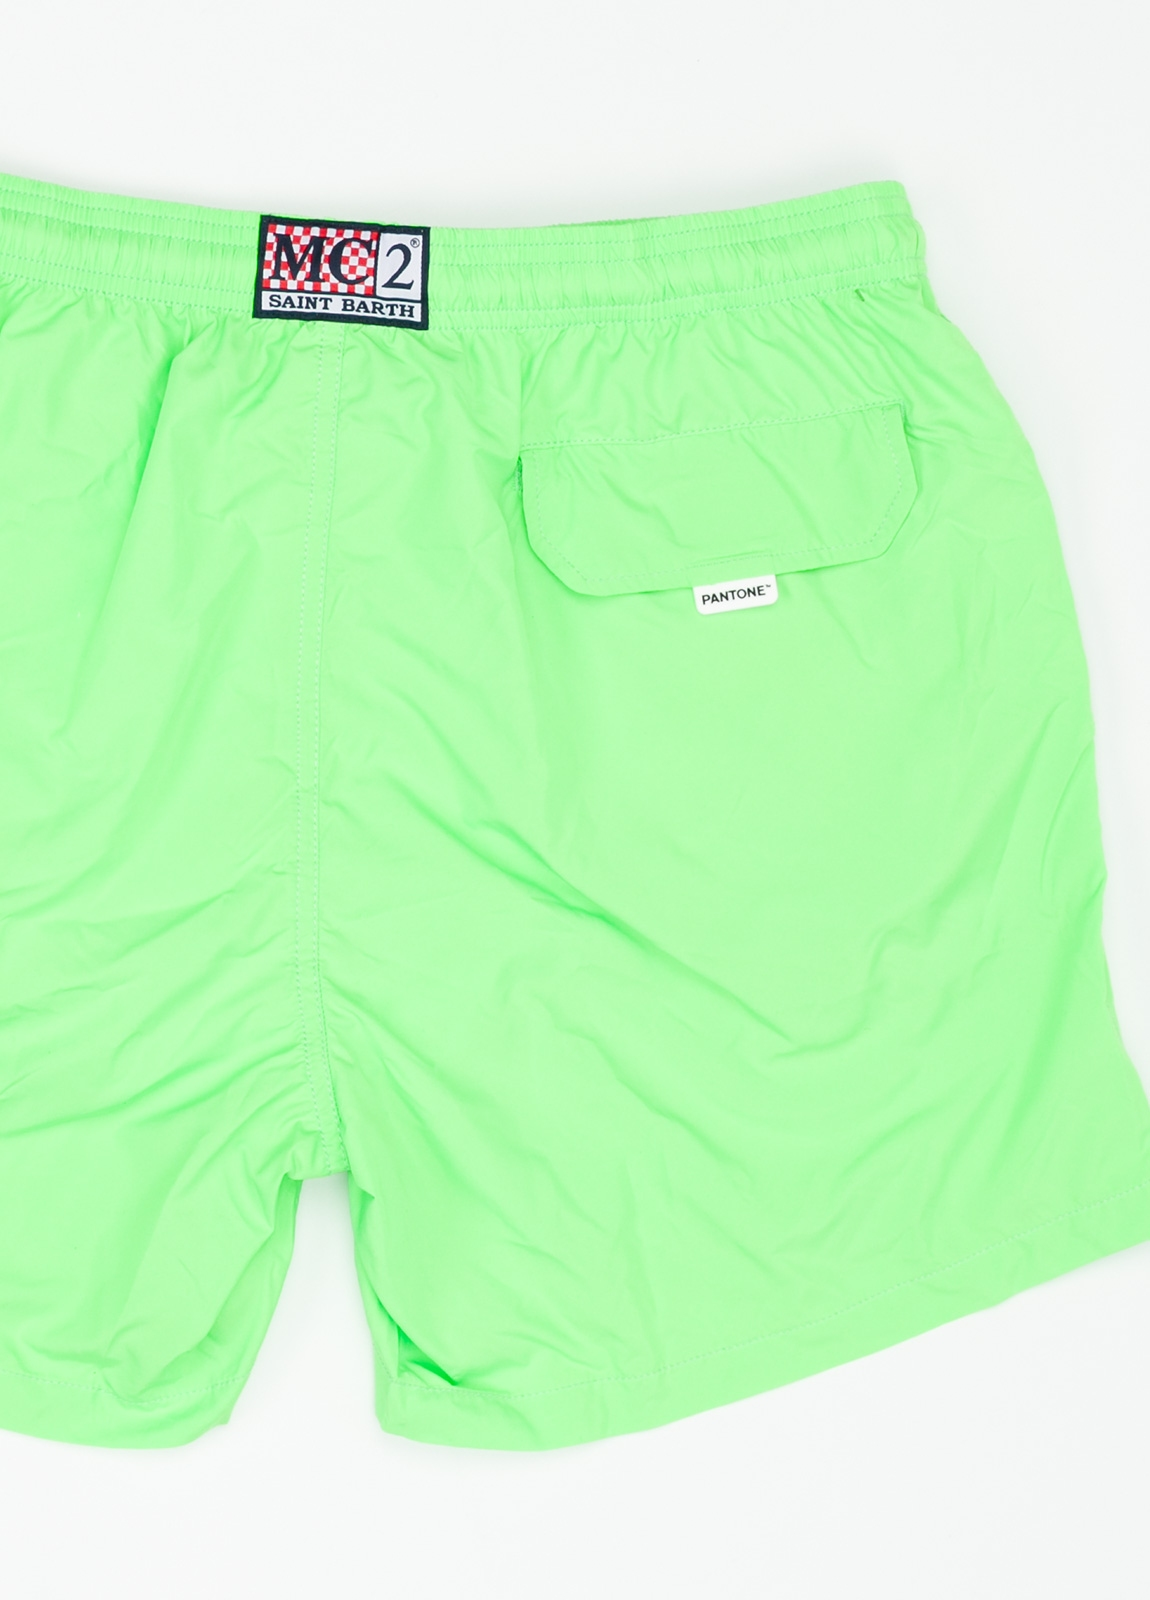 Bañador liso modelo SUPREME color verde, microfibra. - Ítem1